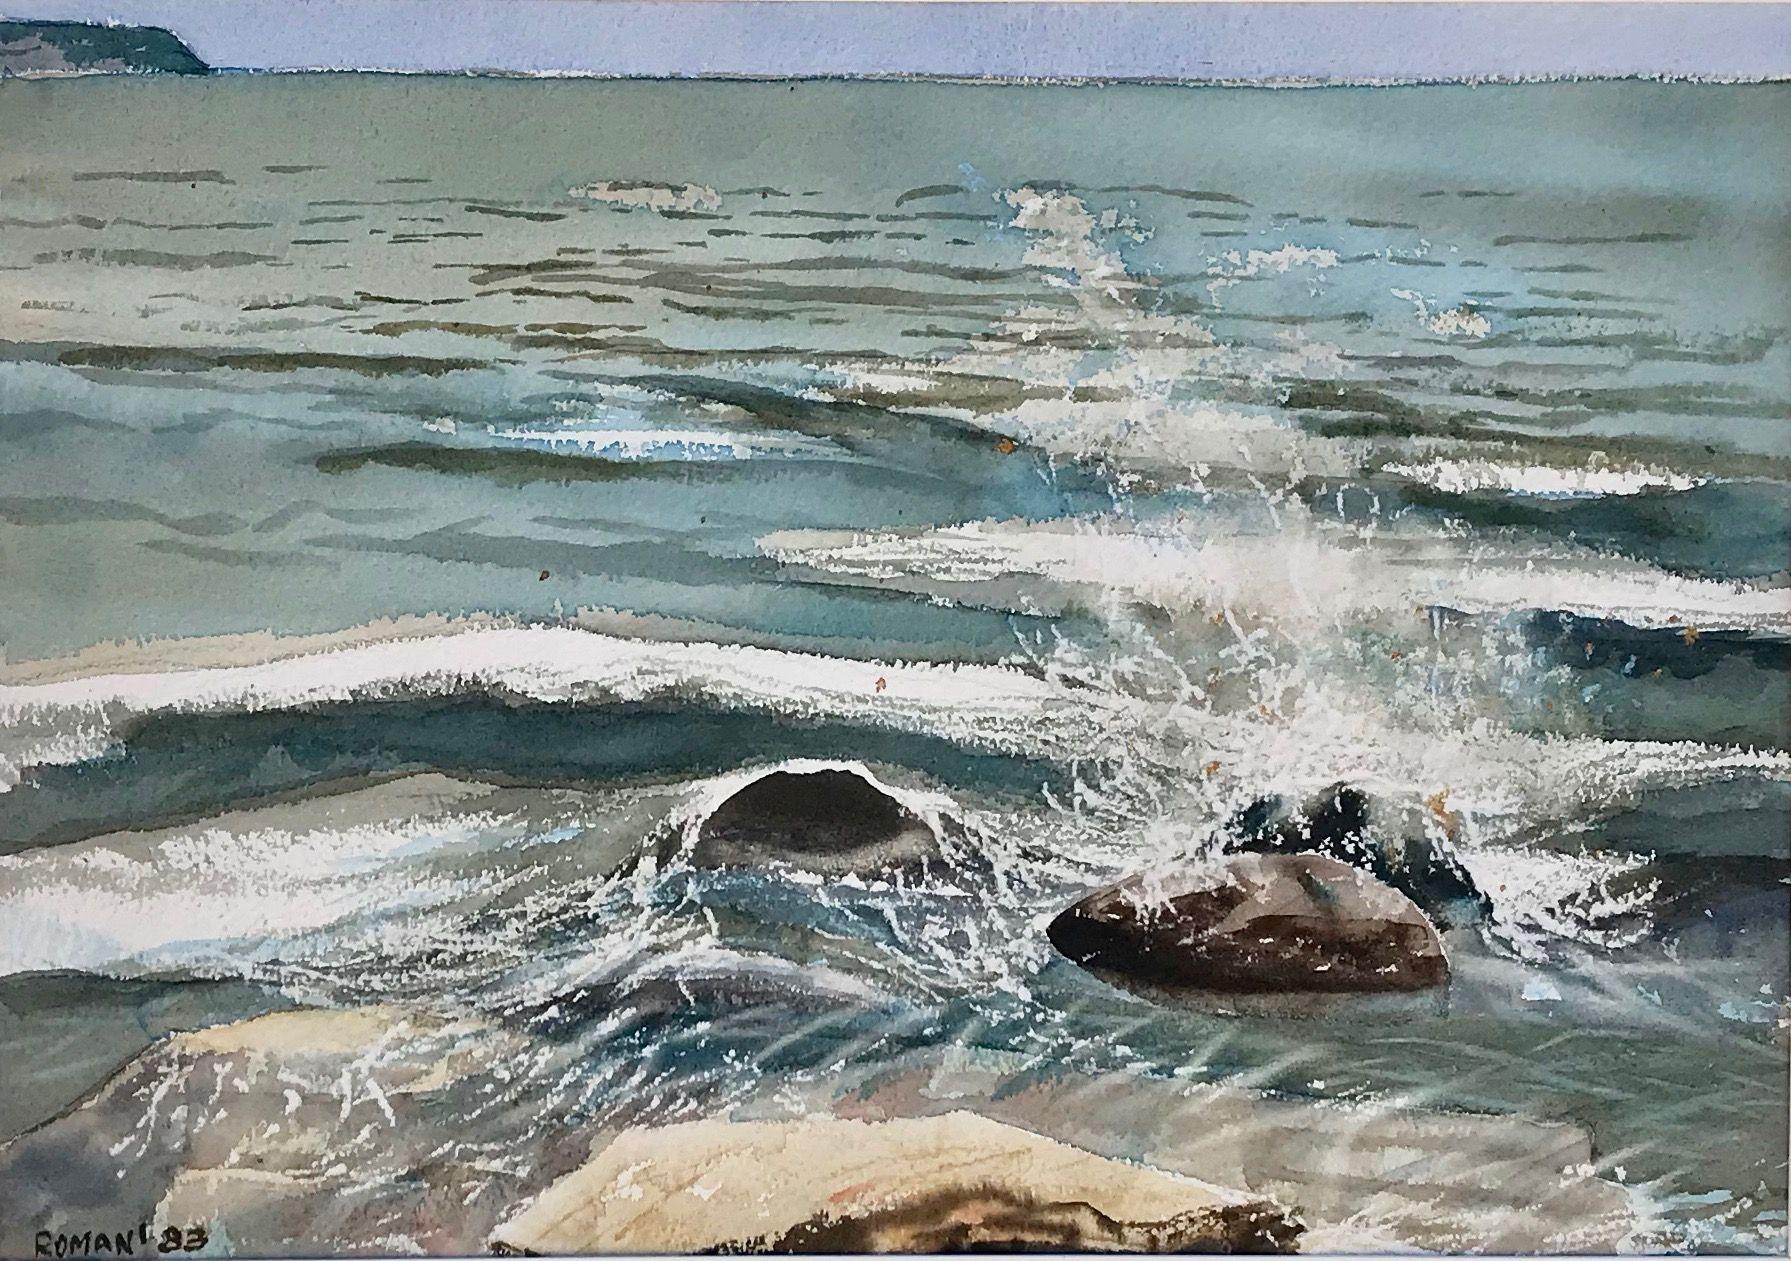 Disappearance (Hecla Island, Sunset Beach Shore)